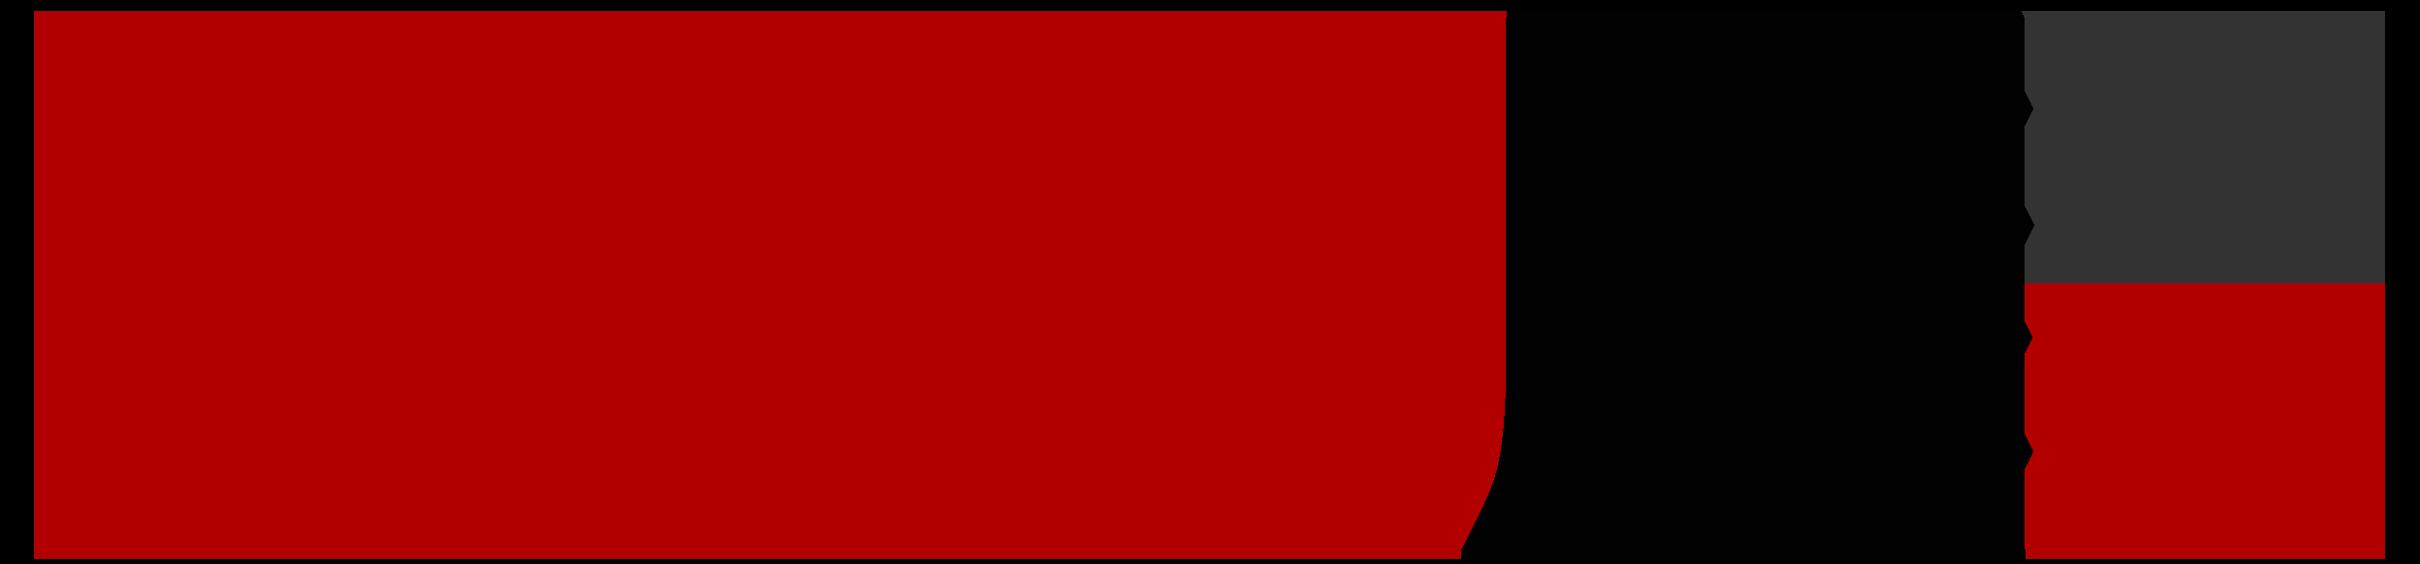 Mobile DJ Insurance